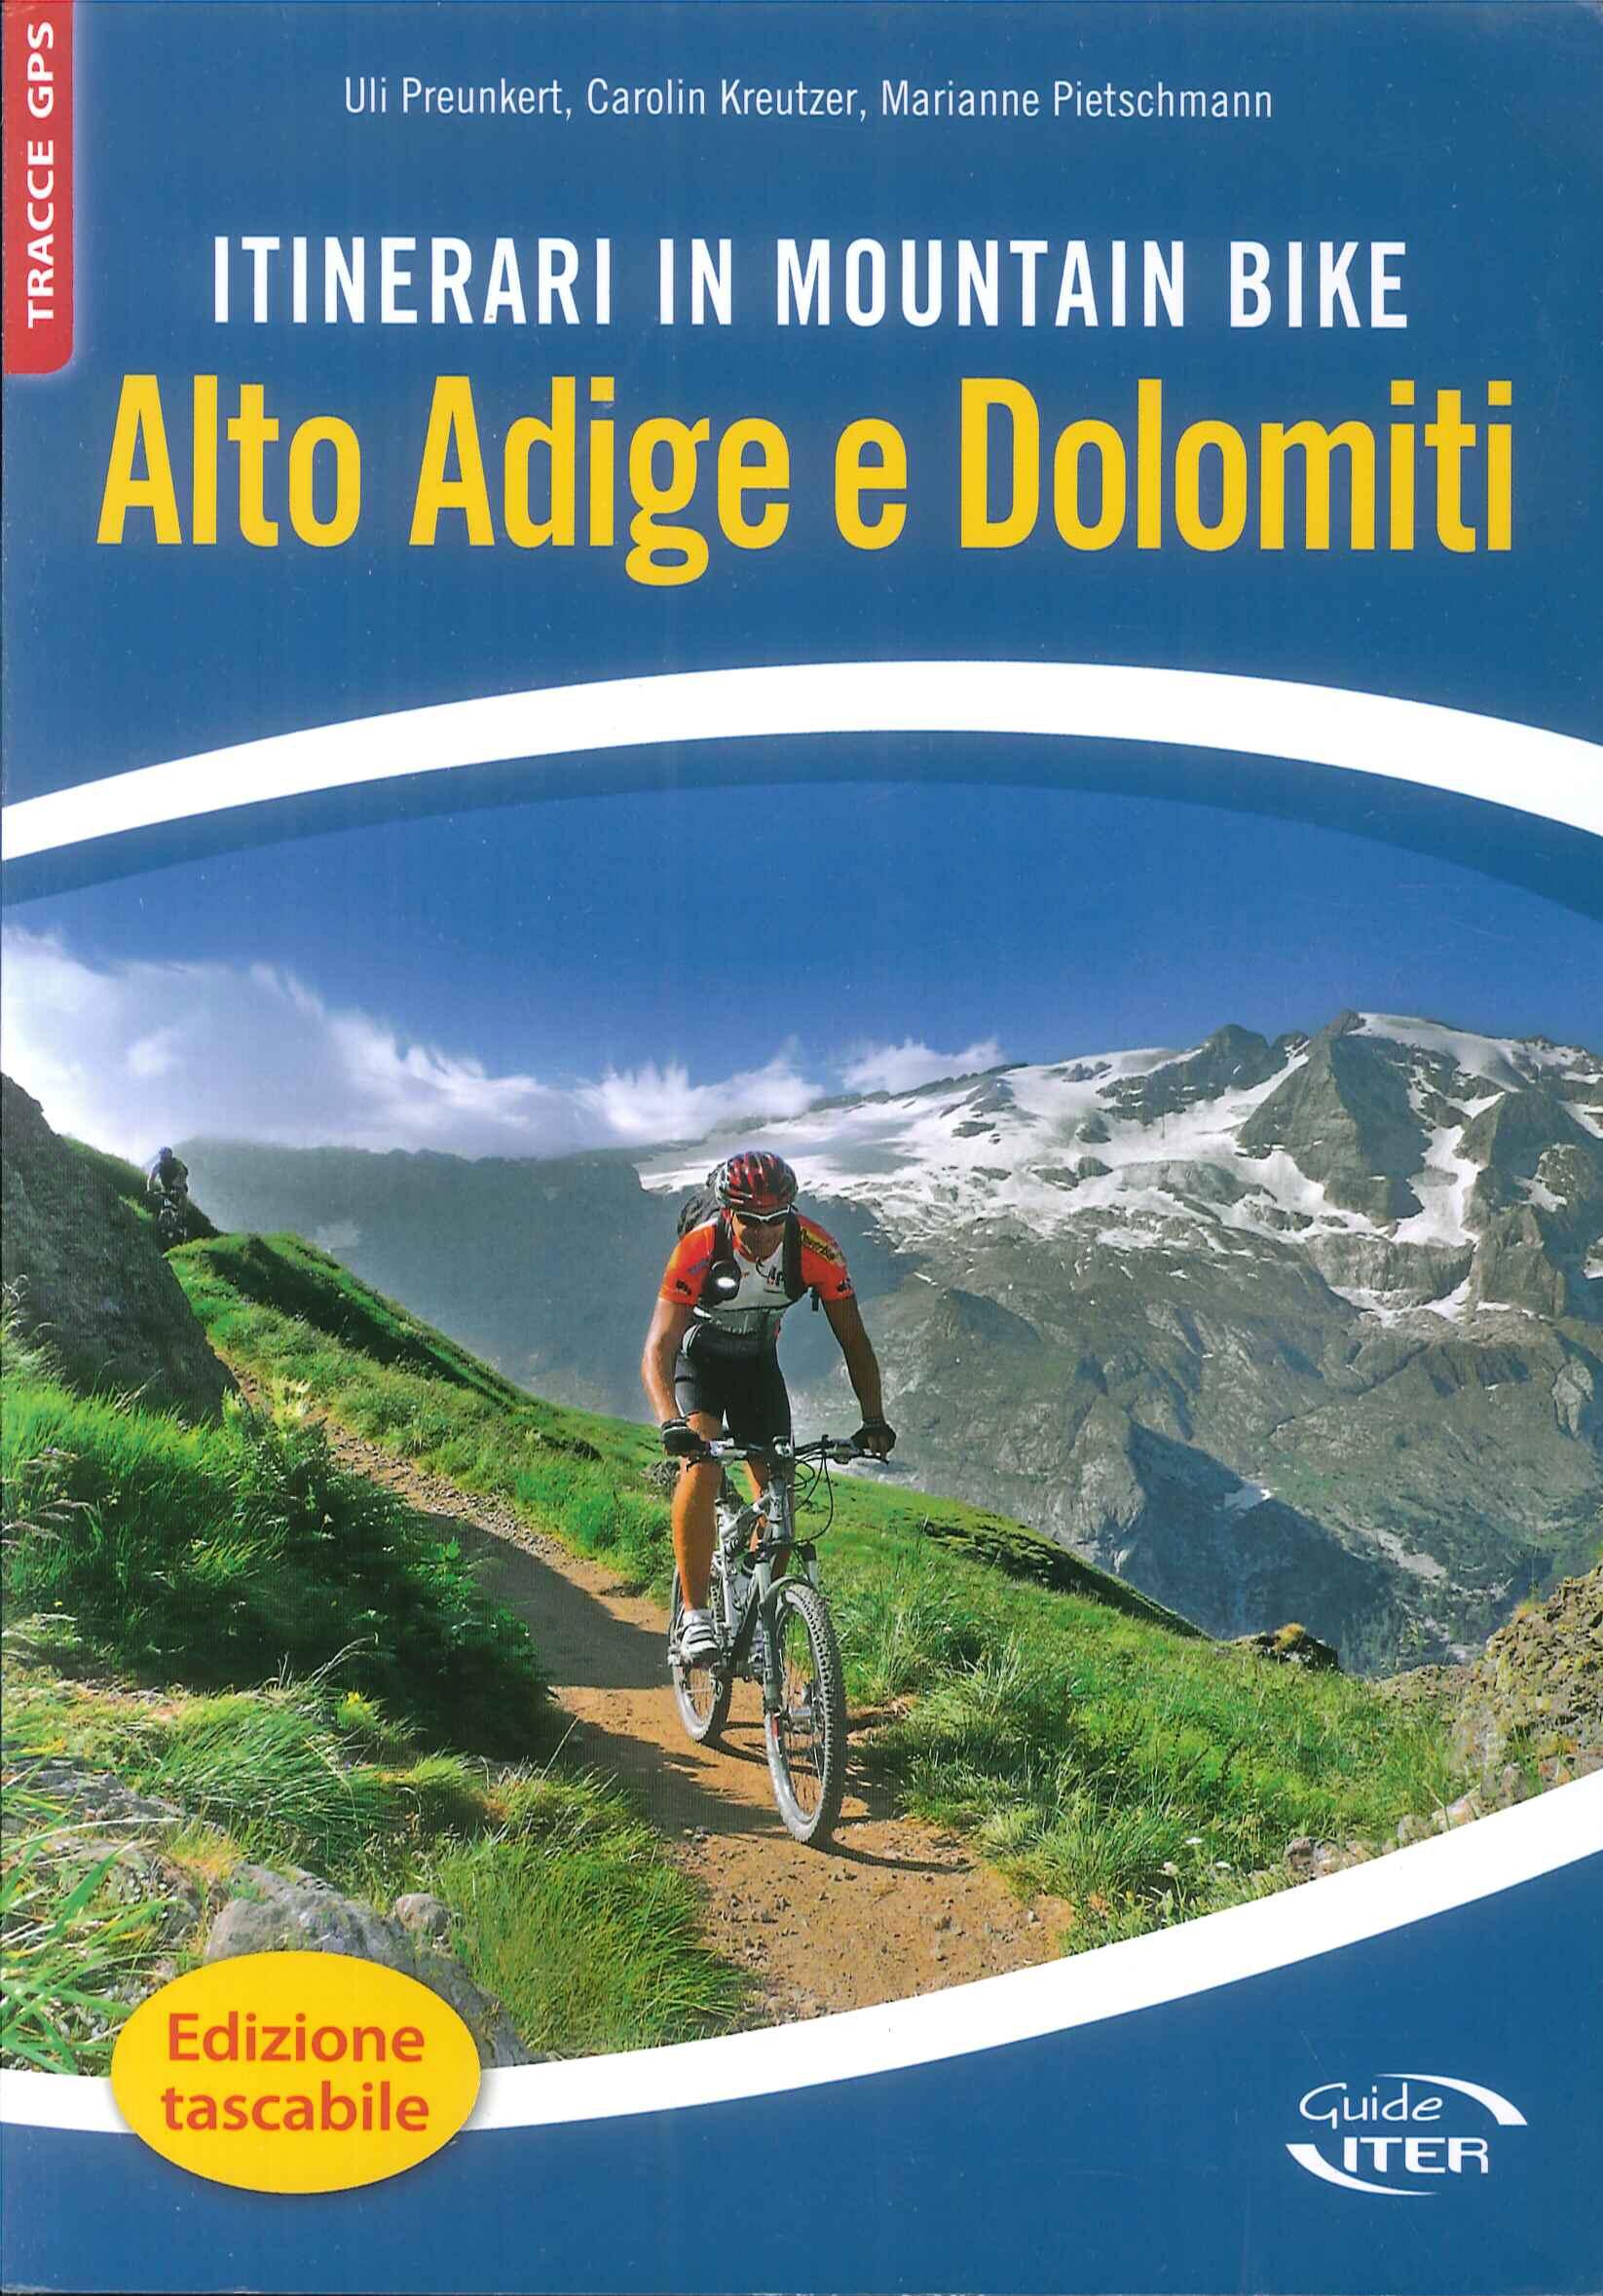 Itinerari in mountain bike. Alto Adige e Dolomiti.